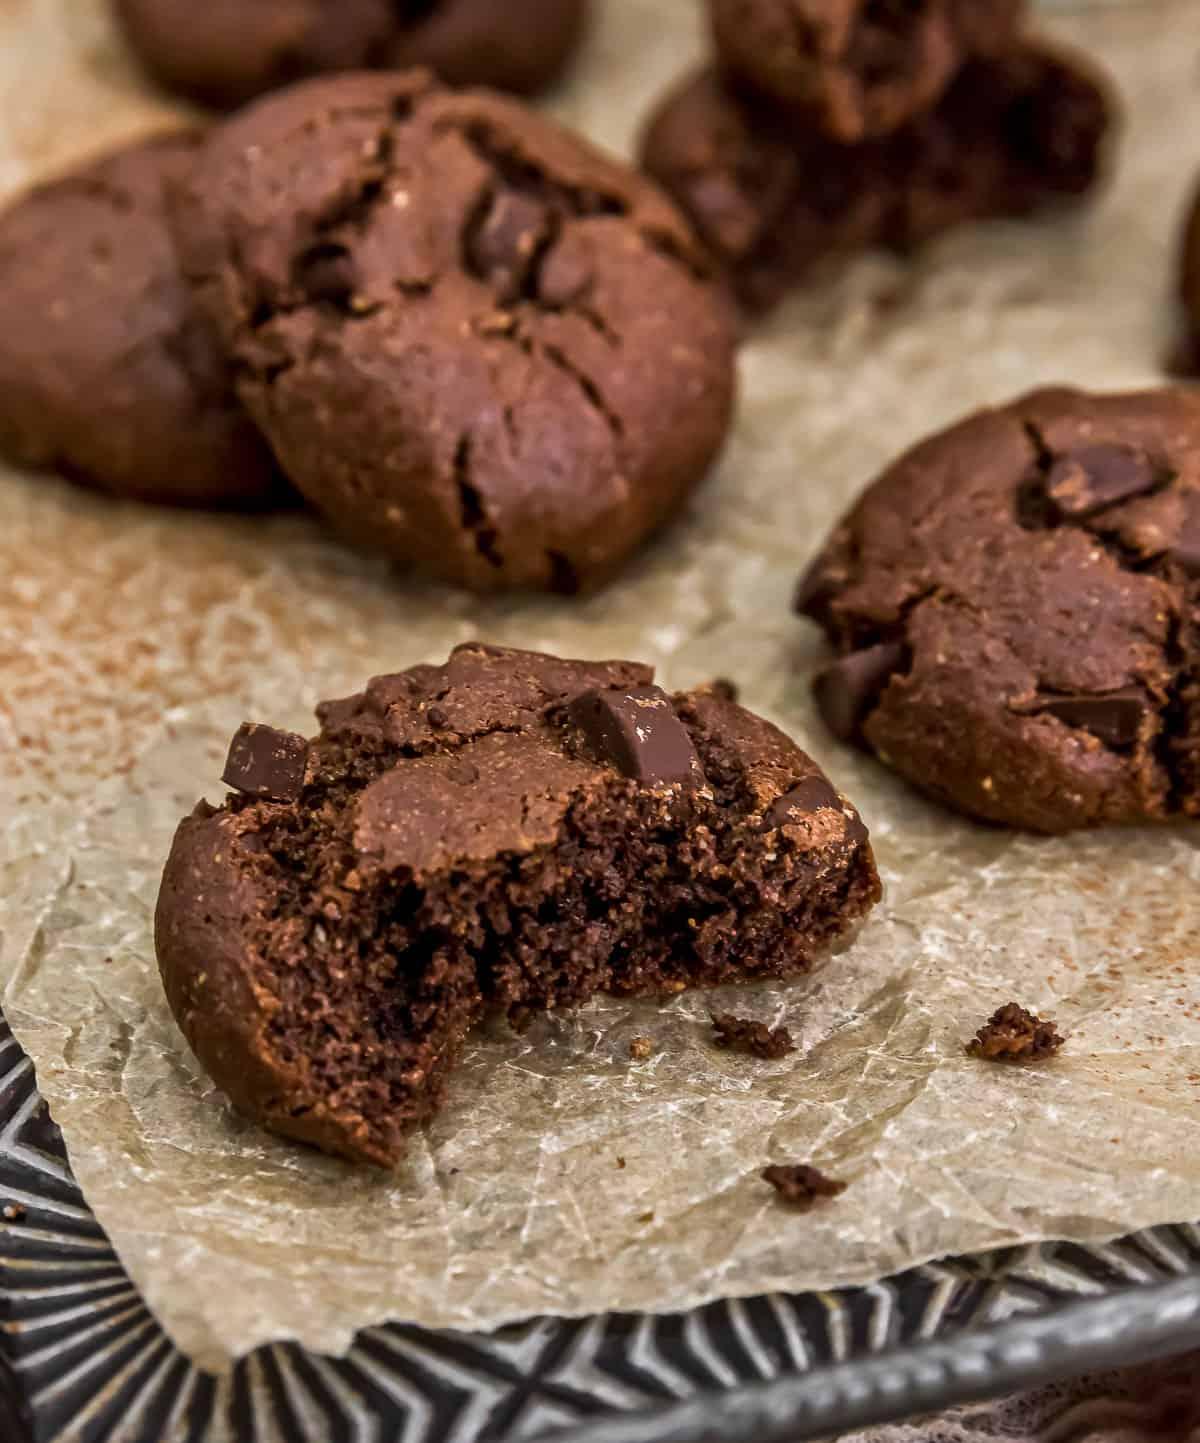 Eating Vegan Double Chocolate Peppermint Cookies